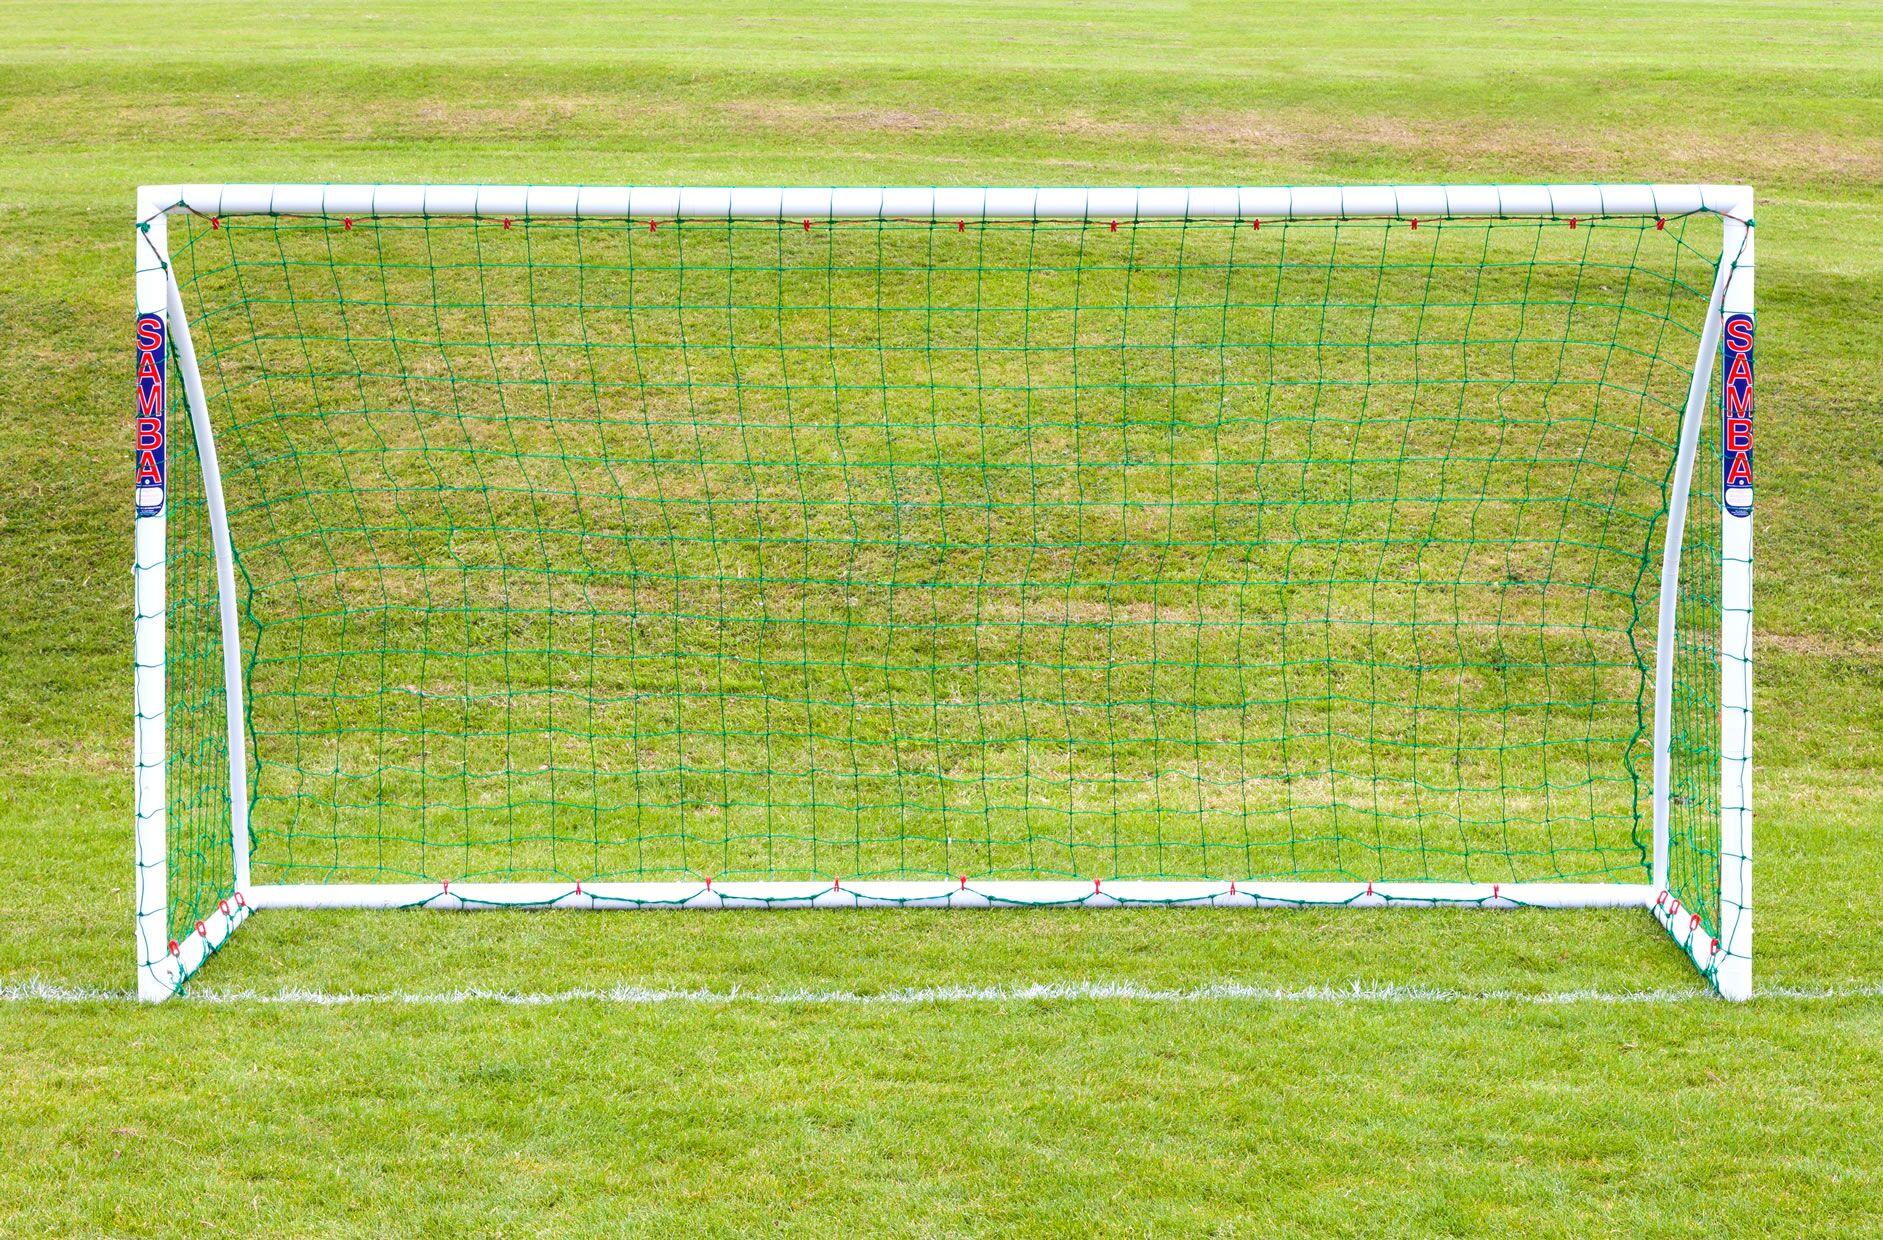 Trainer Goal 12' x 6'